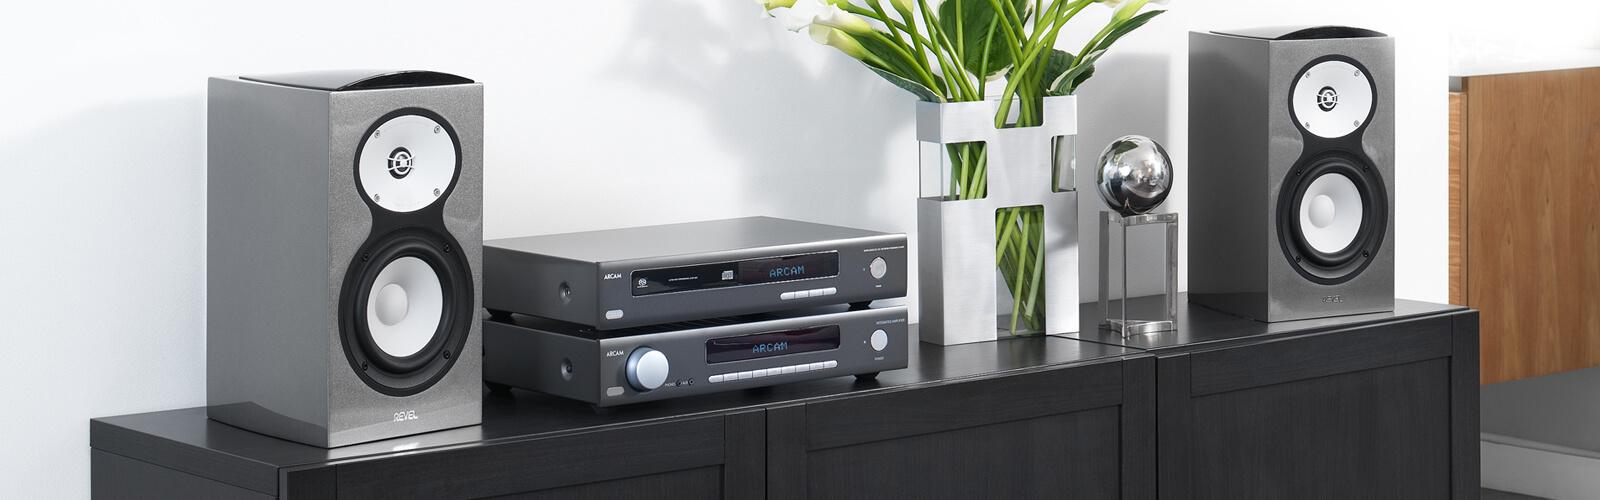 shelf stereo system - consumer electronics